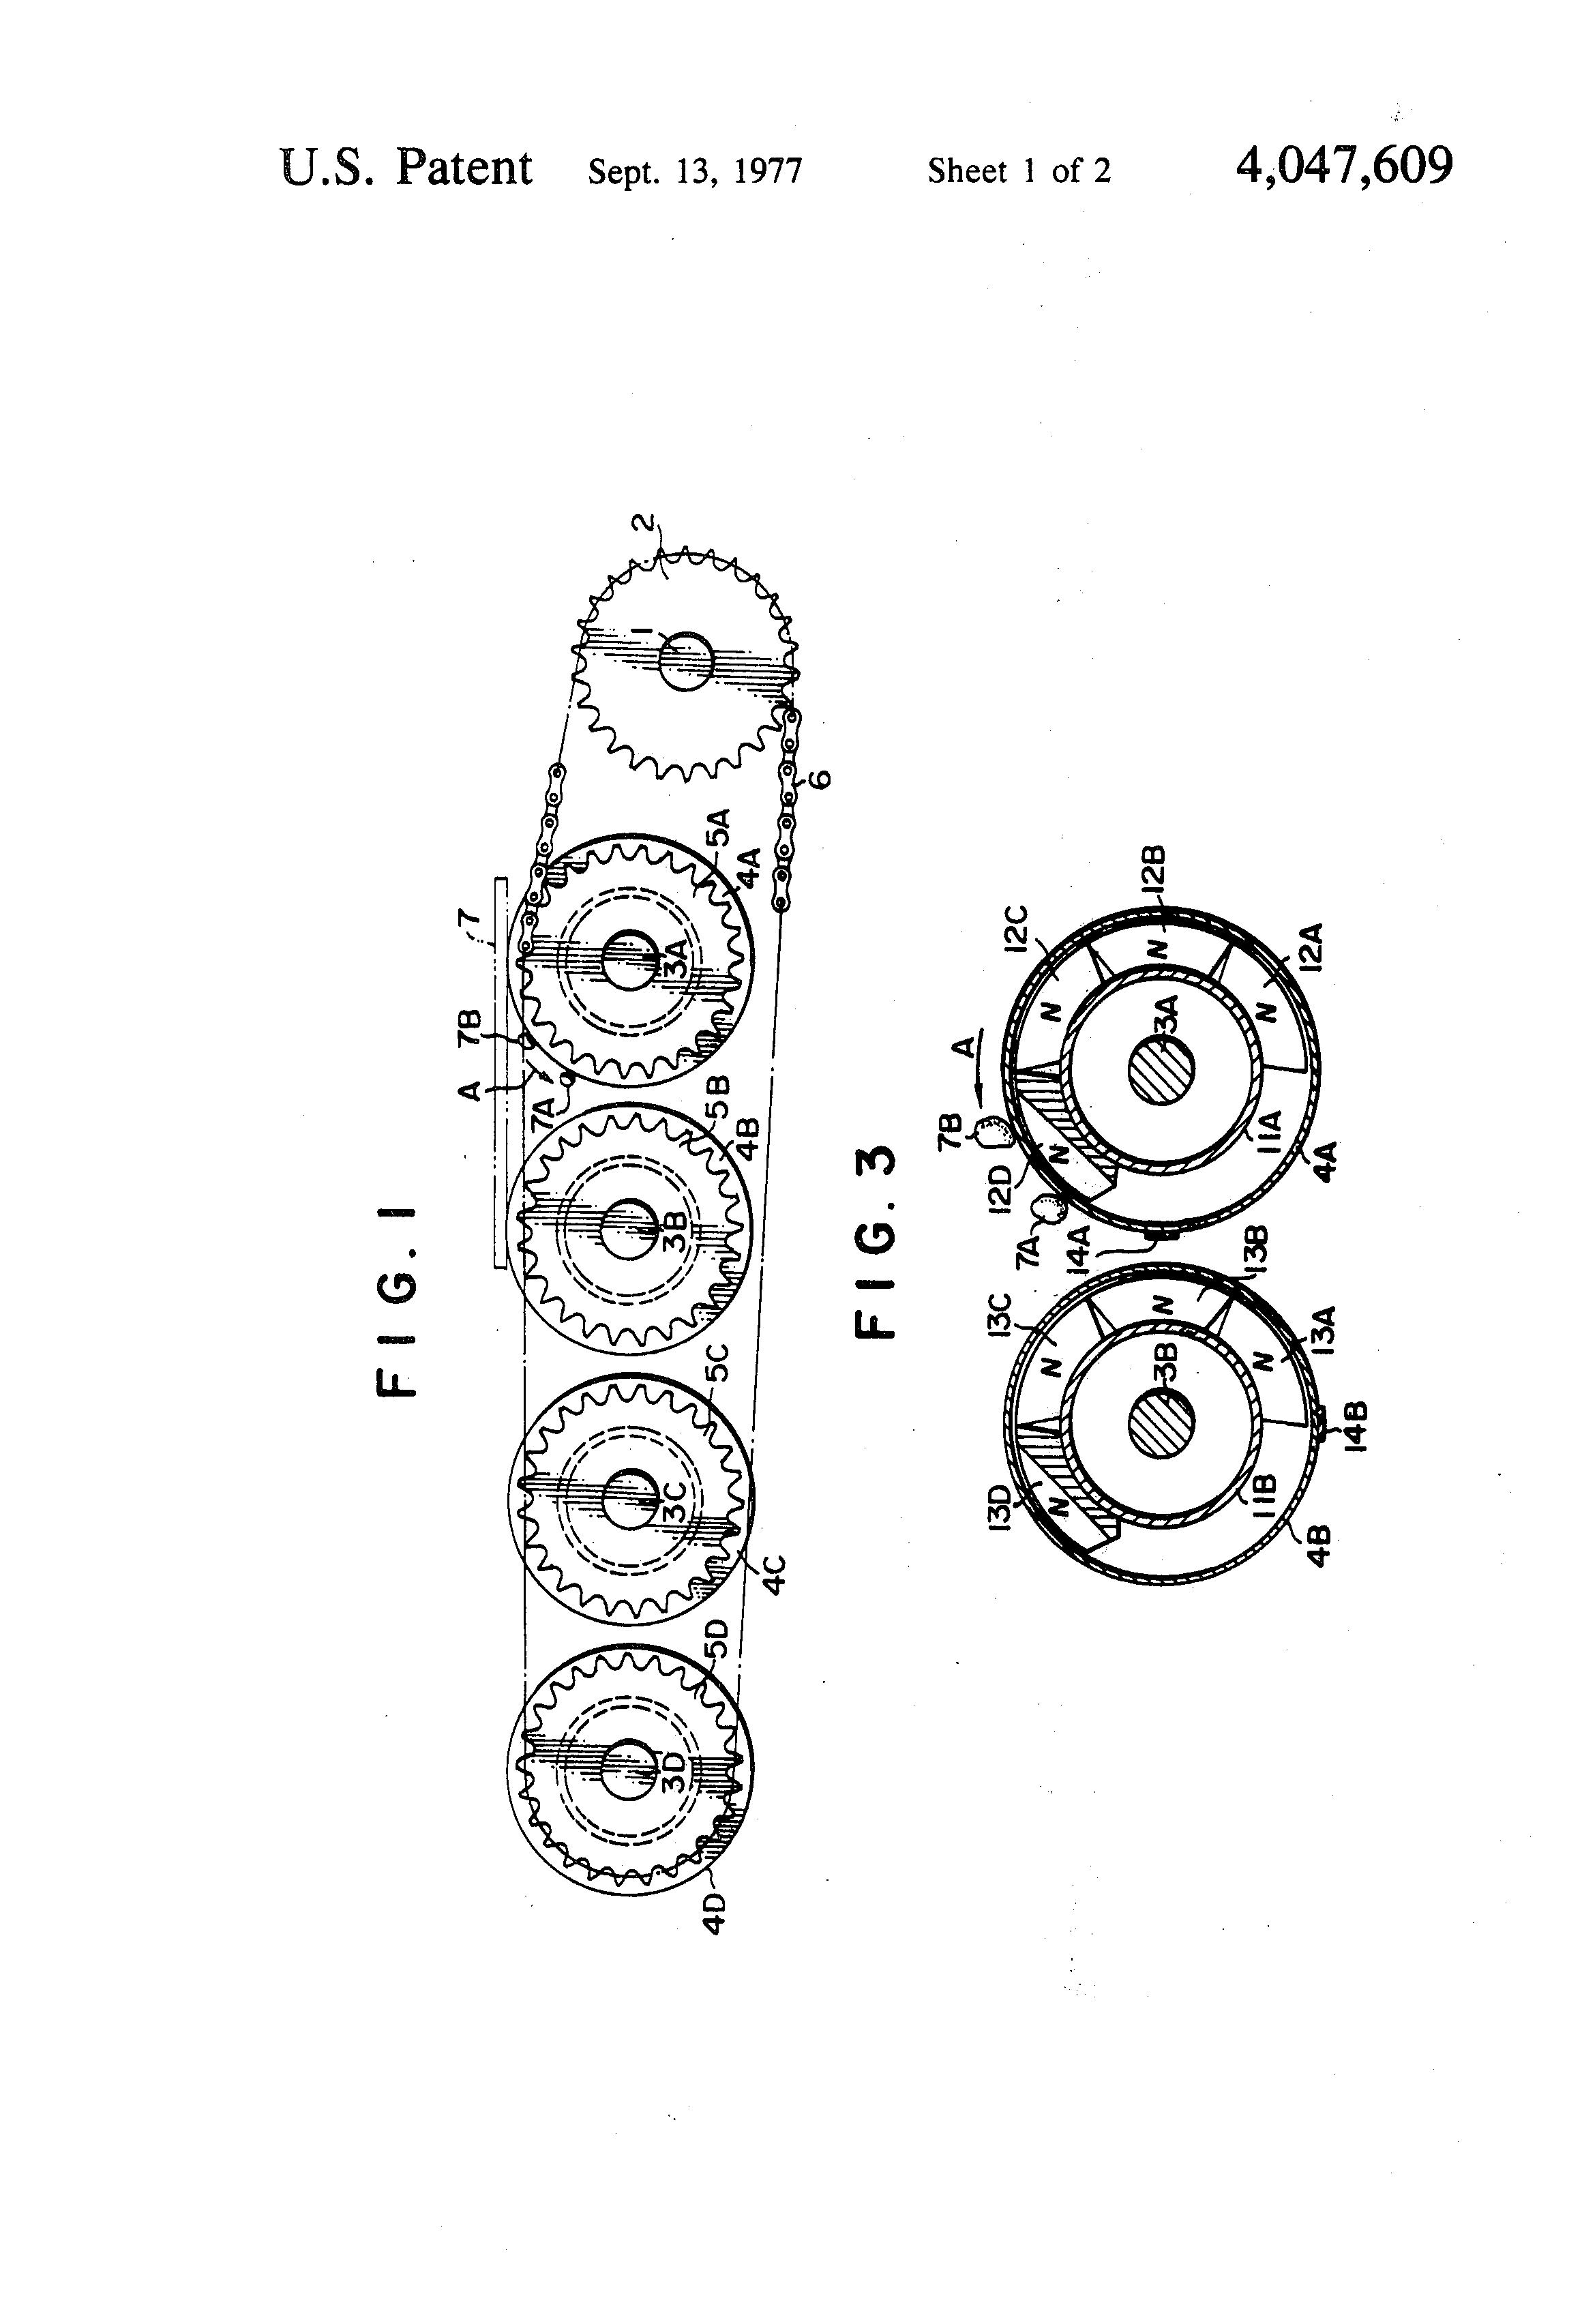 segment magnets auto electrical wiring diagram samsung refrigerator rf30hdedtsr wiring diagram #3